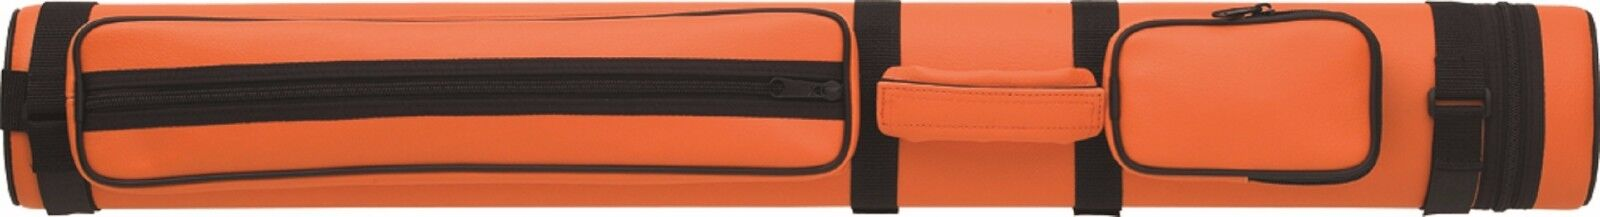 Action 2x2 Pool Cue Case Orange w/ FREE Shipping